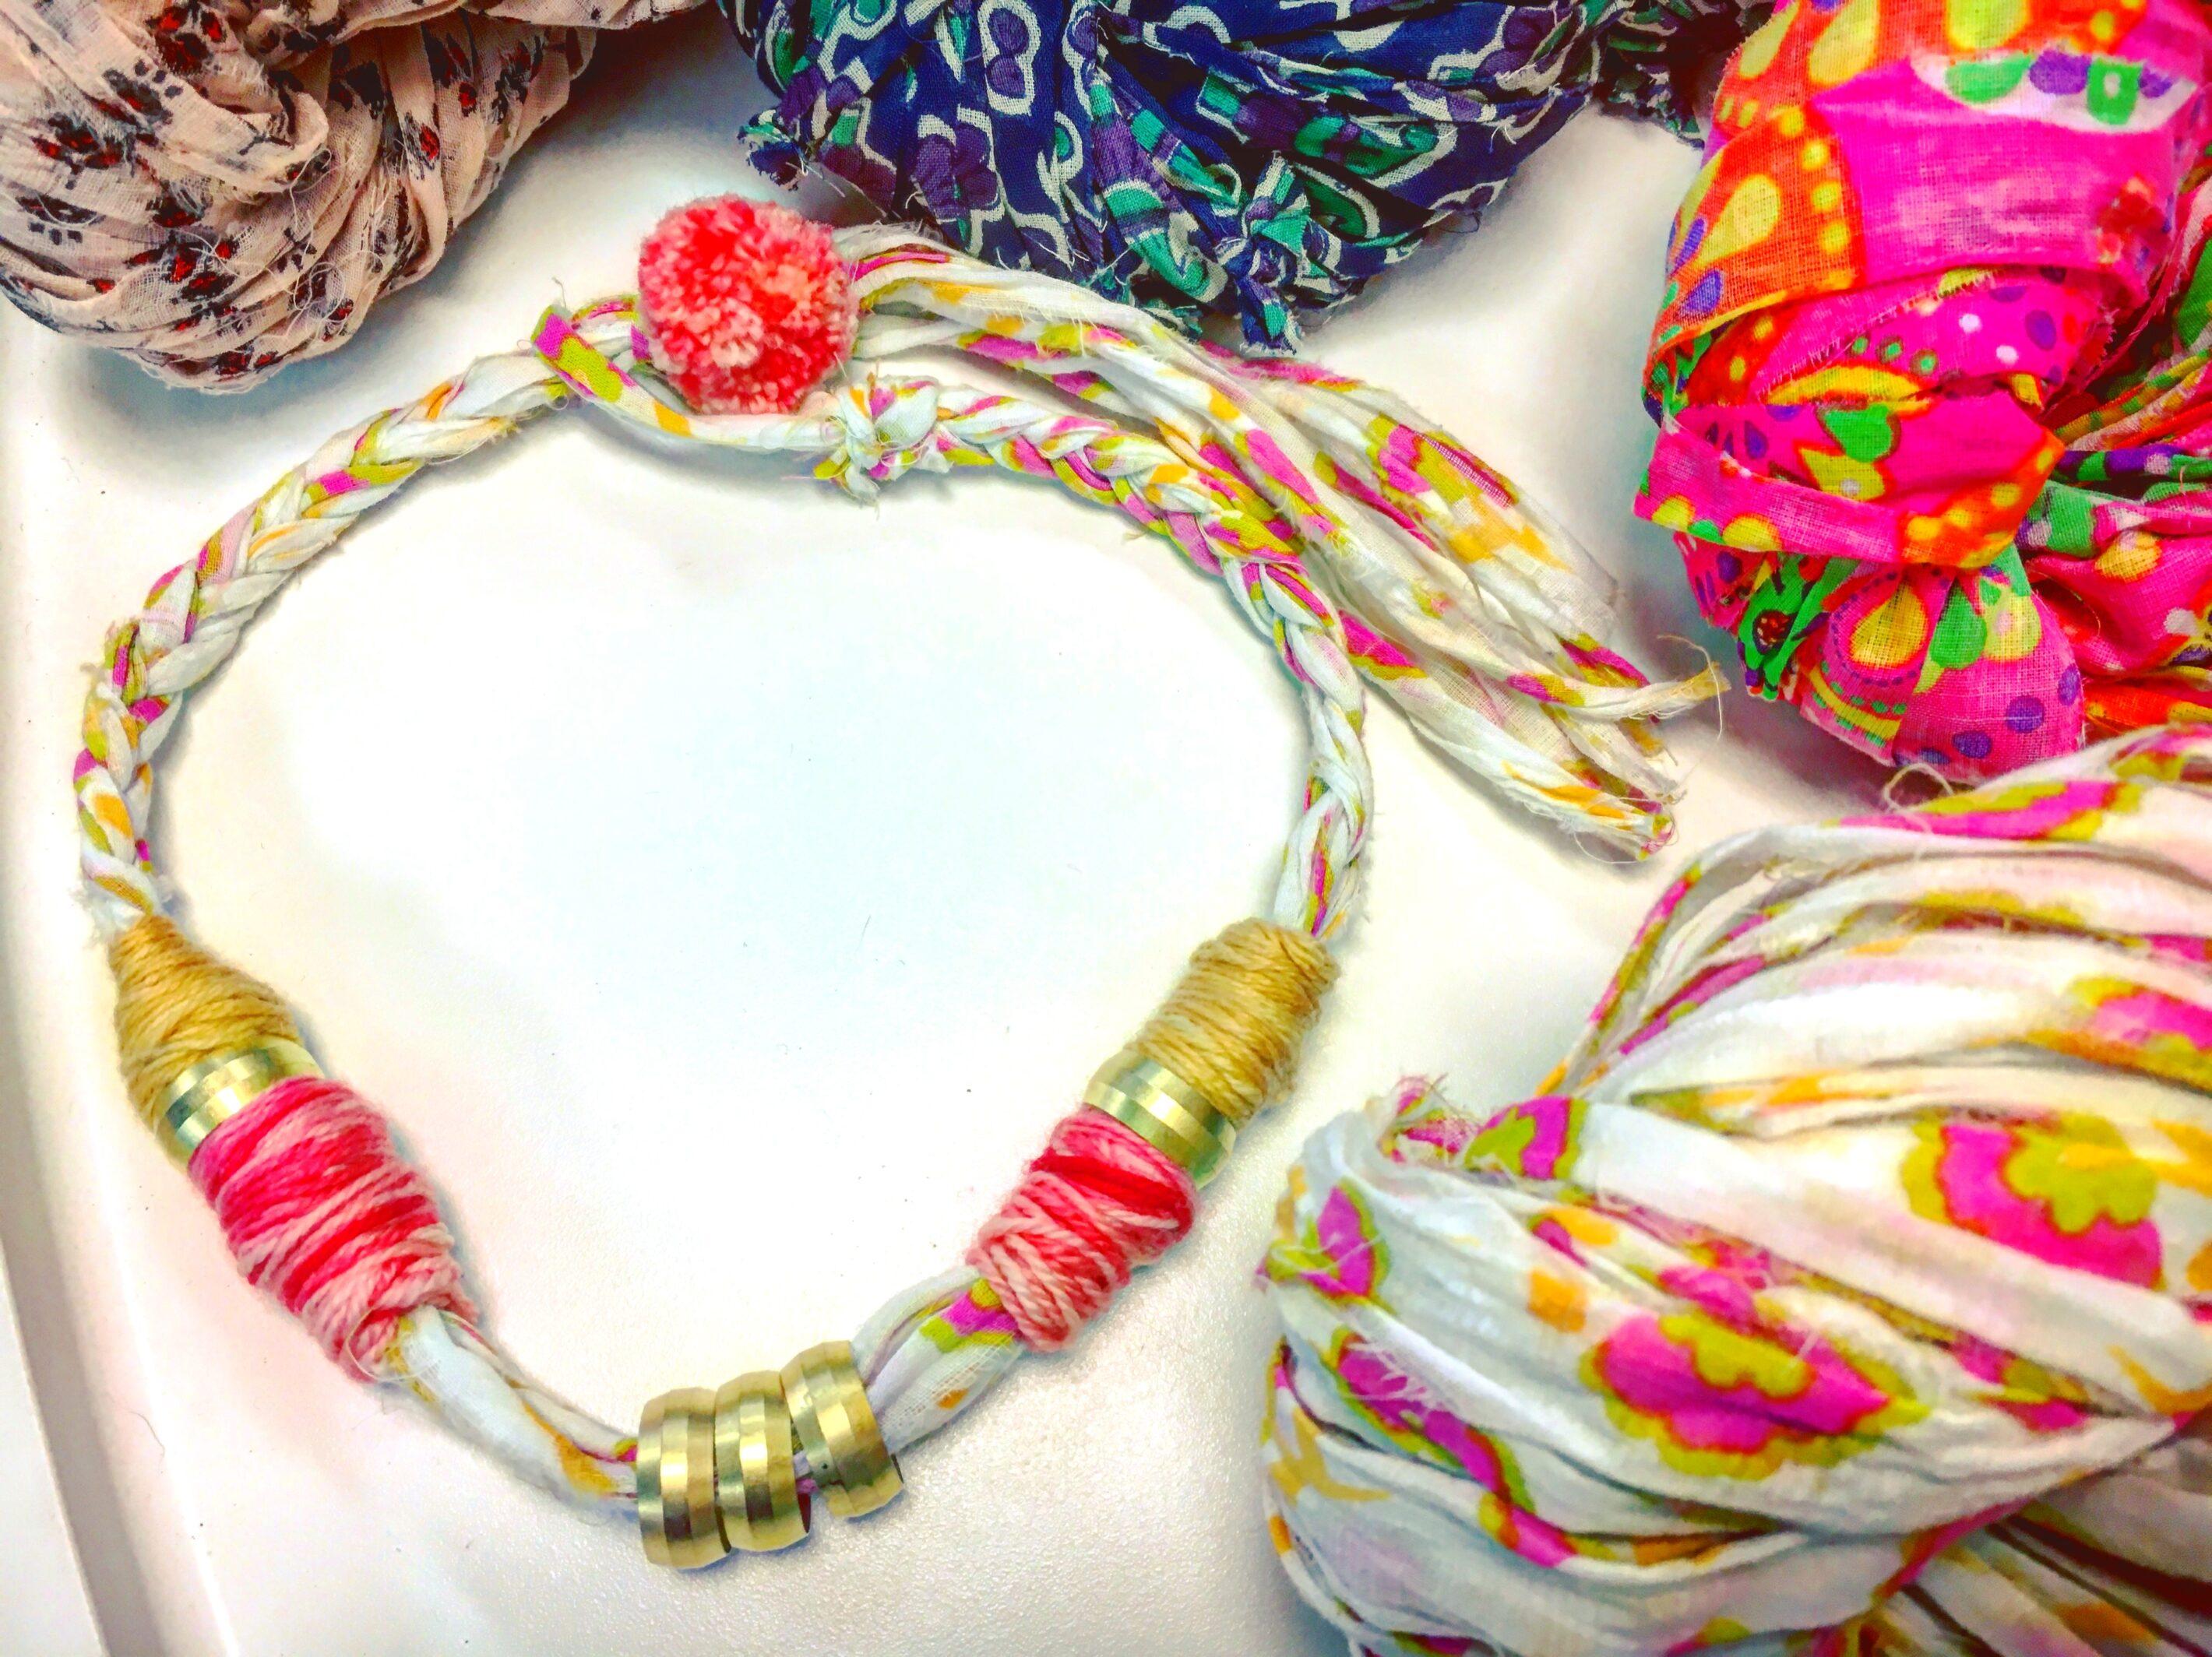 ImagiKnit Yarn Shop Omaha classes